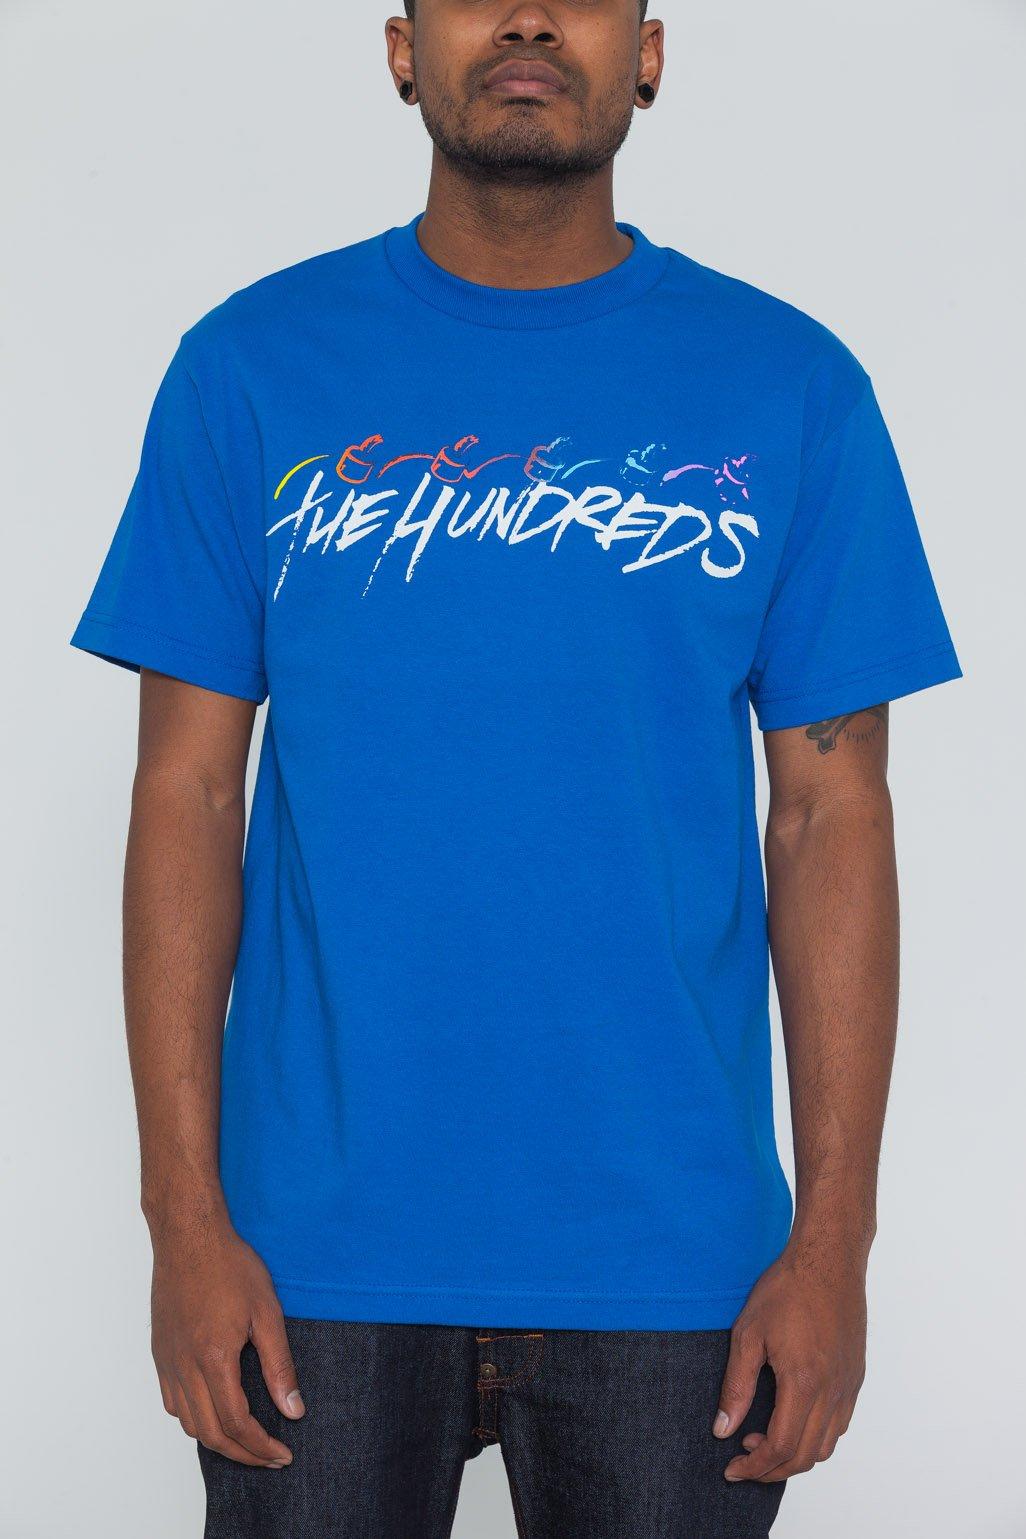 Brushmarker T-Shirt